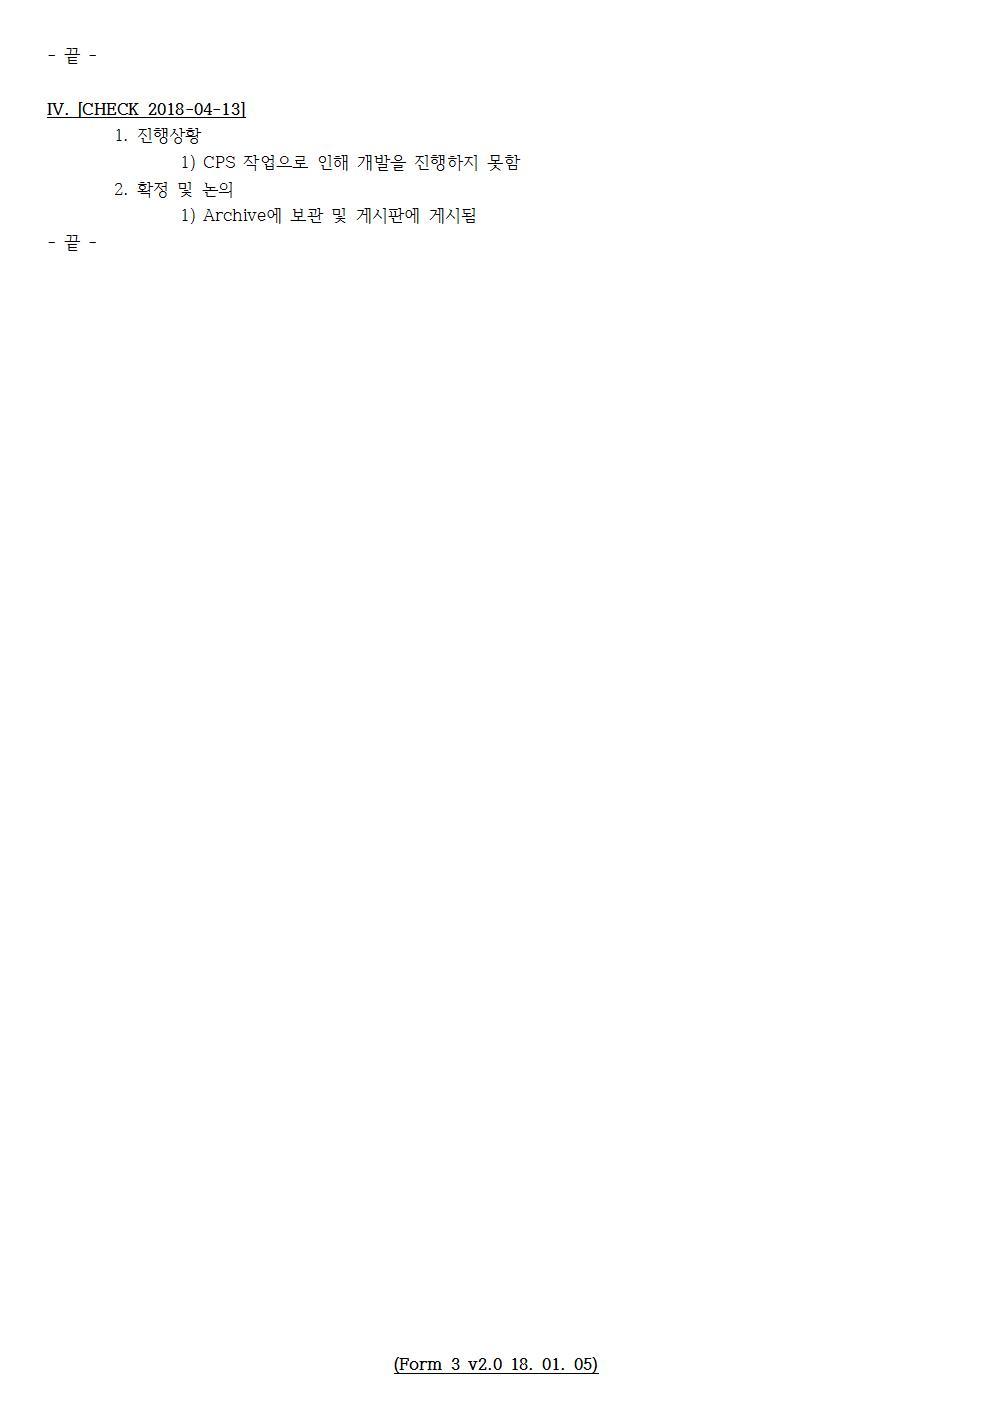 D-[18-001-RD-01]-[SAVE 3.0]-[2018-04-13][SH]002.jpg